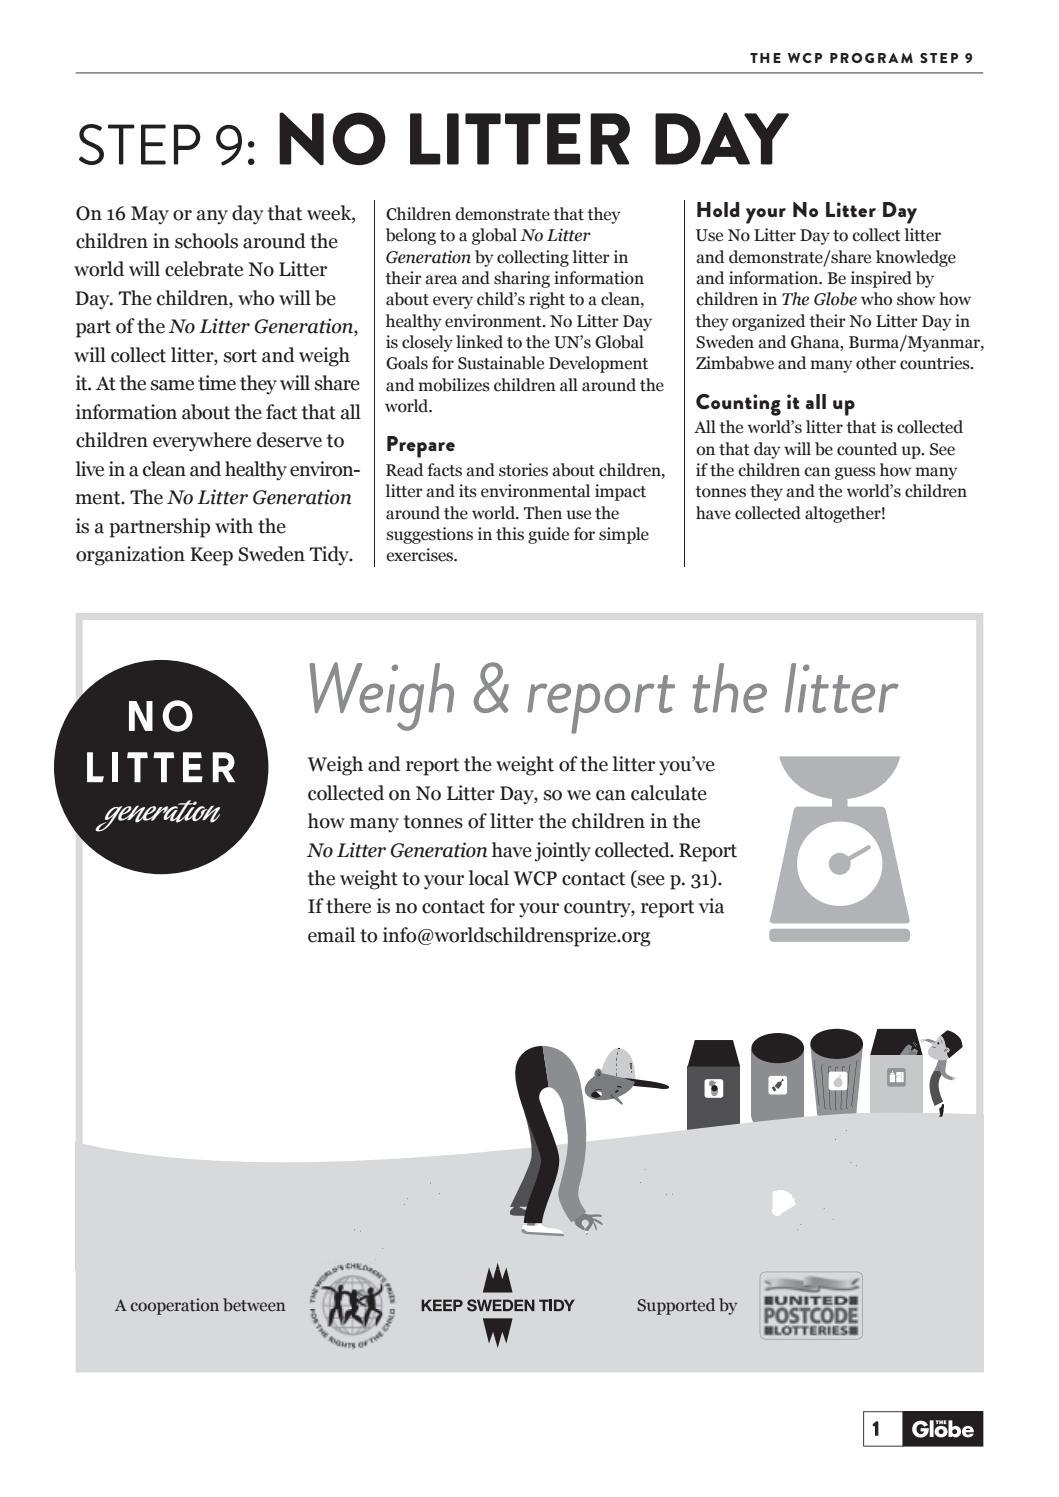 No Litter Generation Teachers Guide English by World's Children's